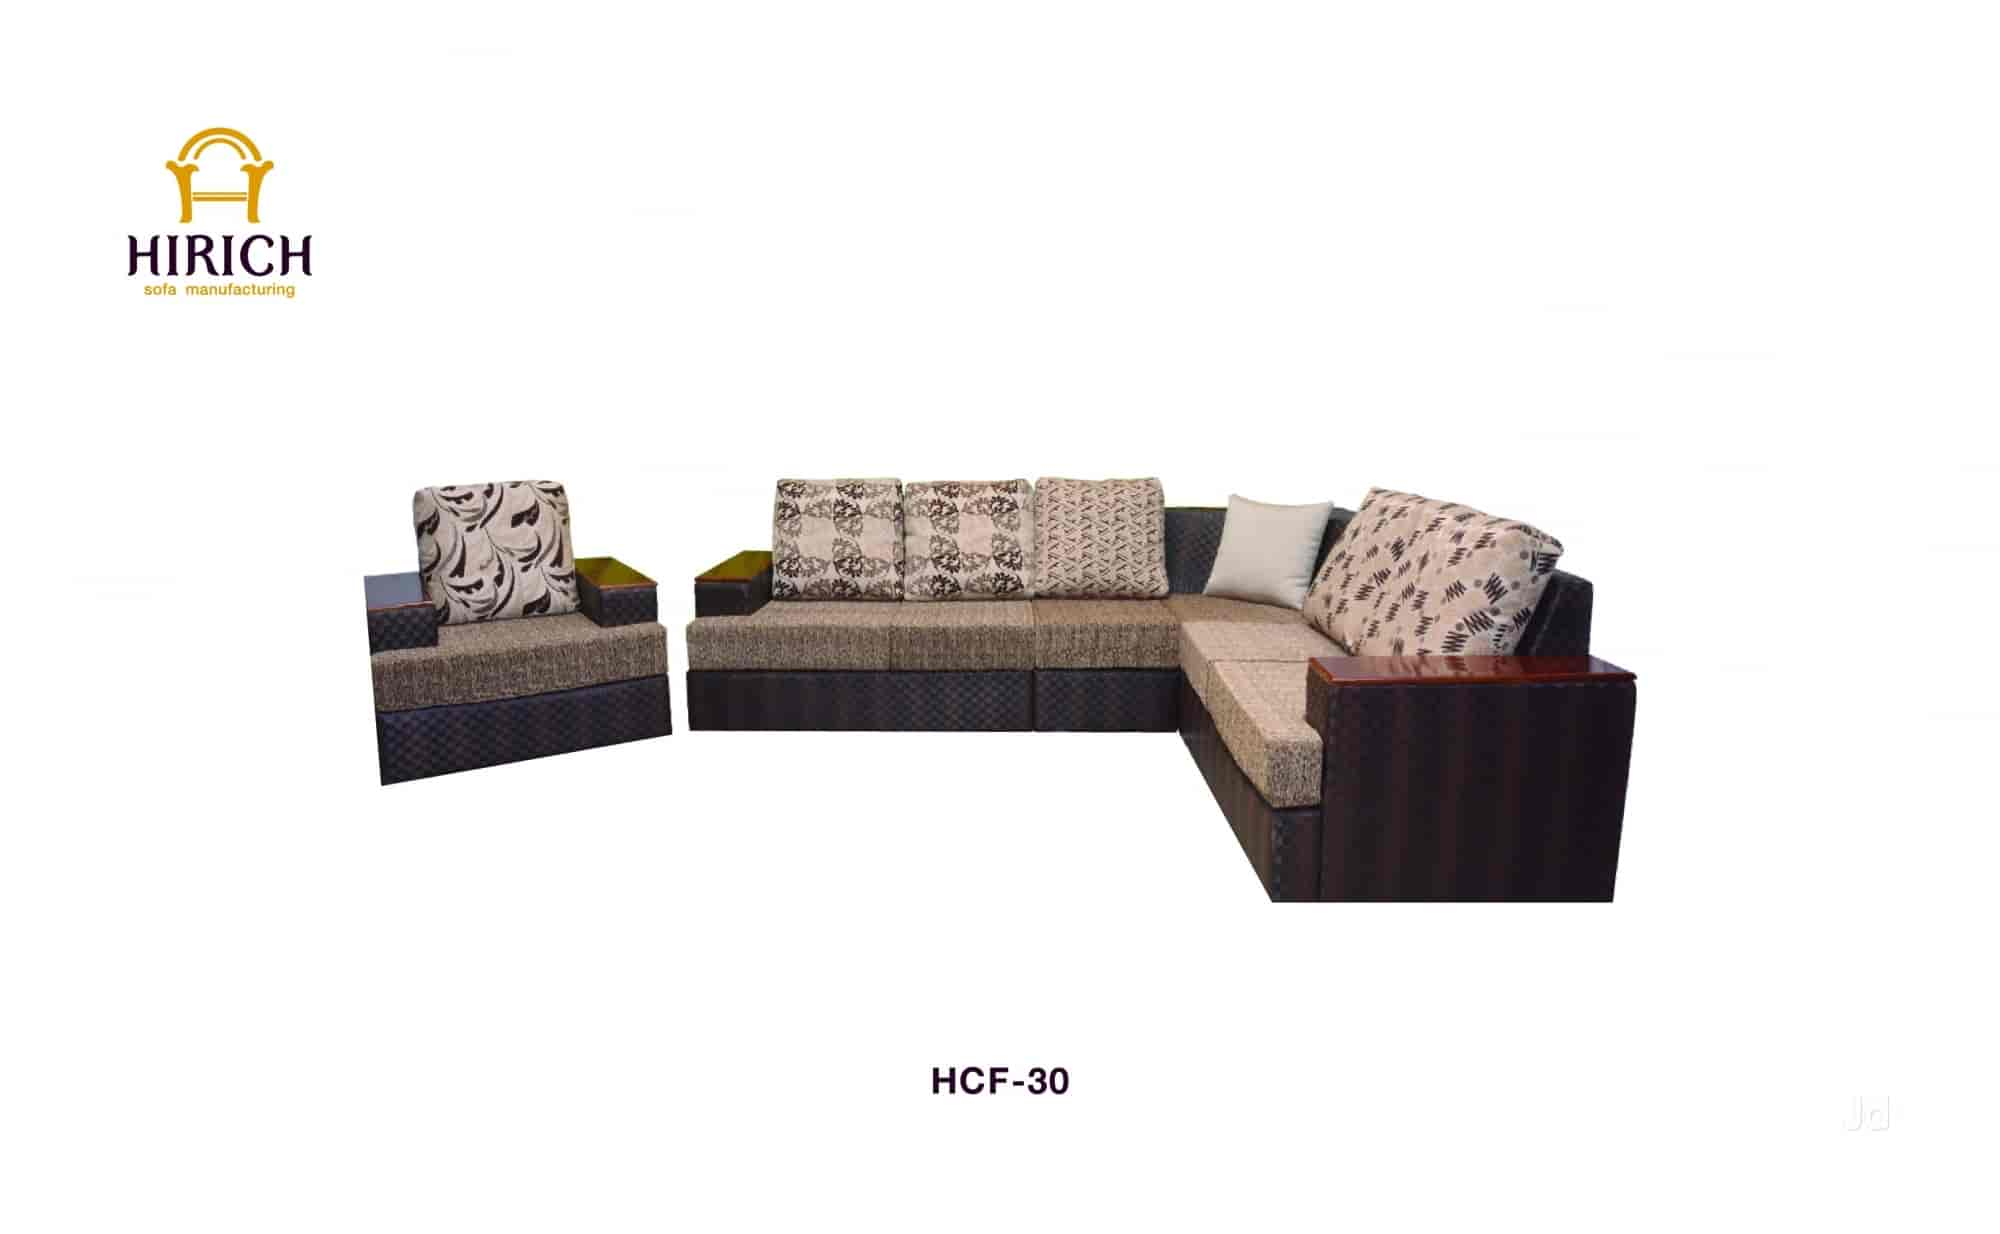 Sensational Hirich Avaniapuram Fabric Sofa Manufacturers In Madurai Ibusinesslaw Wood Chair Design Ideas Ibusinesslaworg